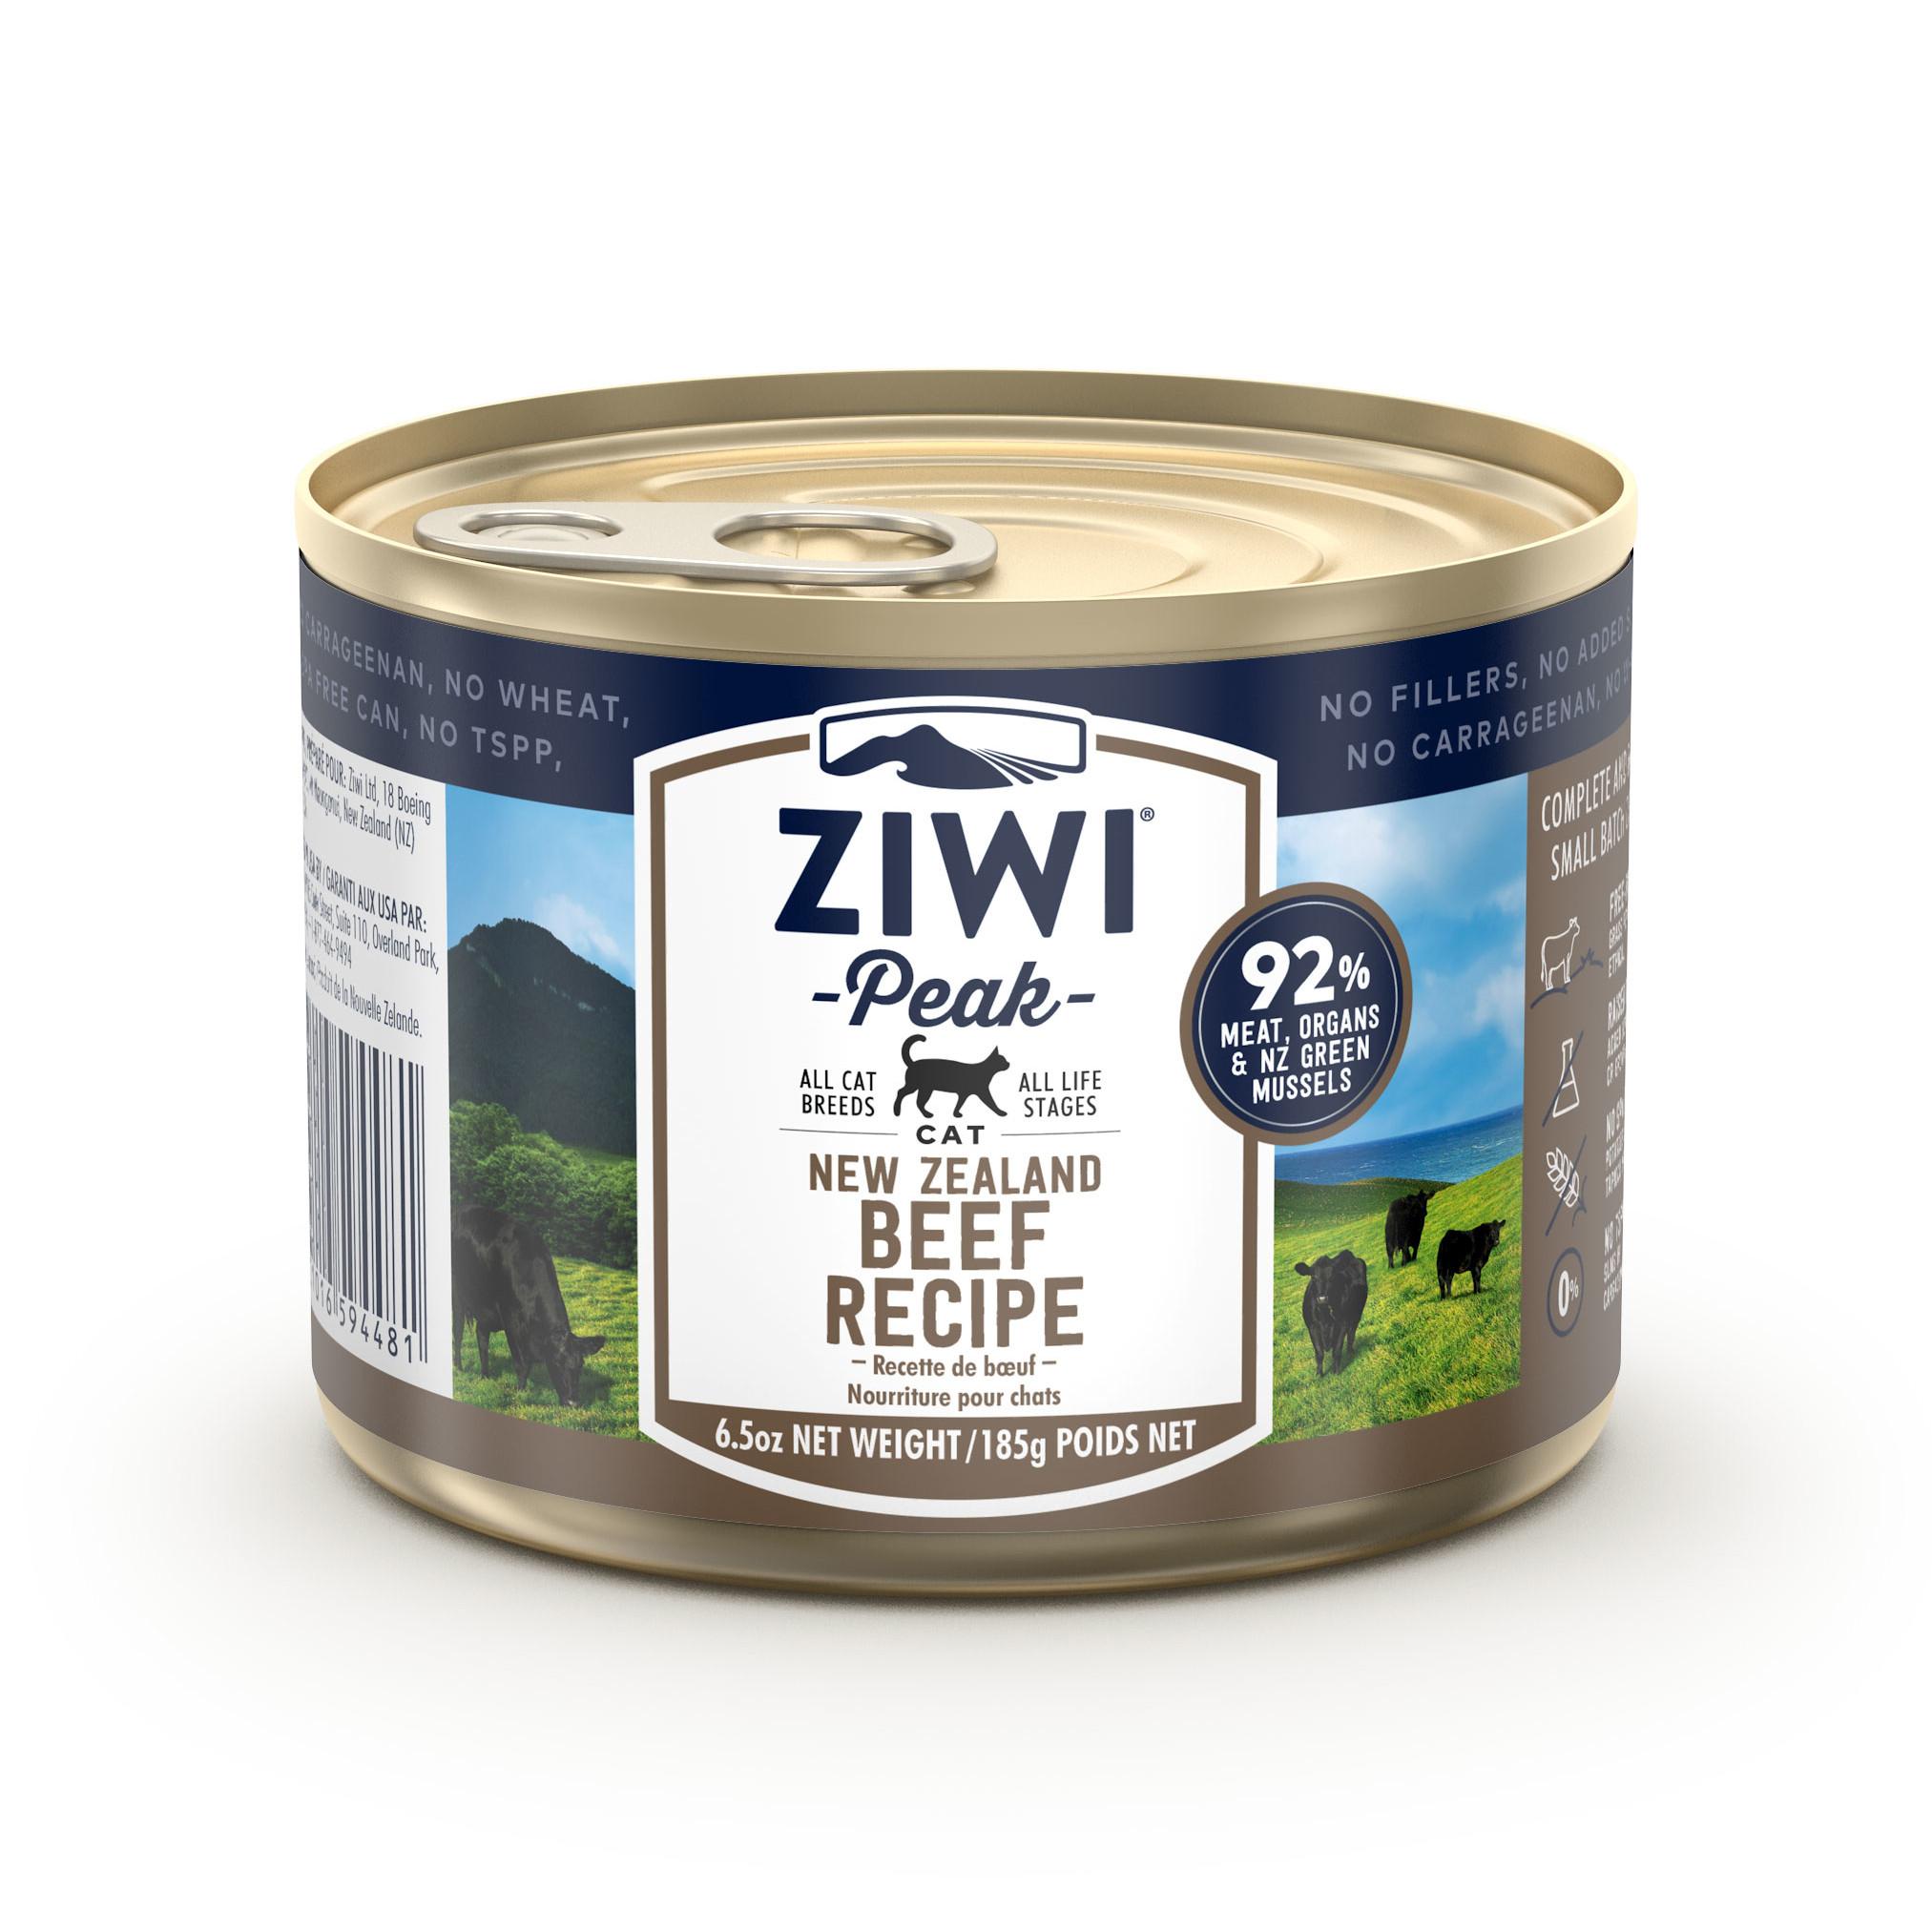 ZIWI Peak Canned Cat Food Beef Recipe, 6.5-oz|185-g